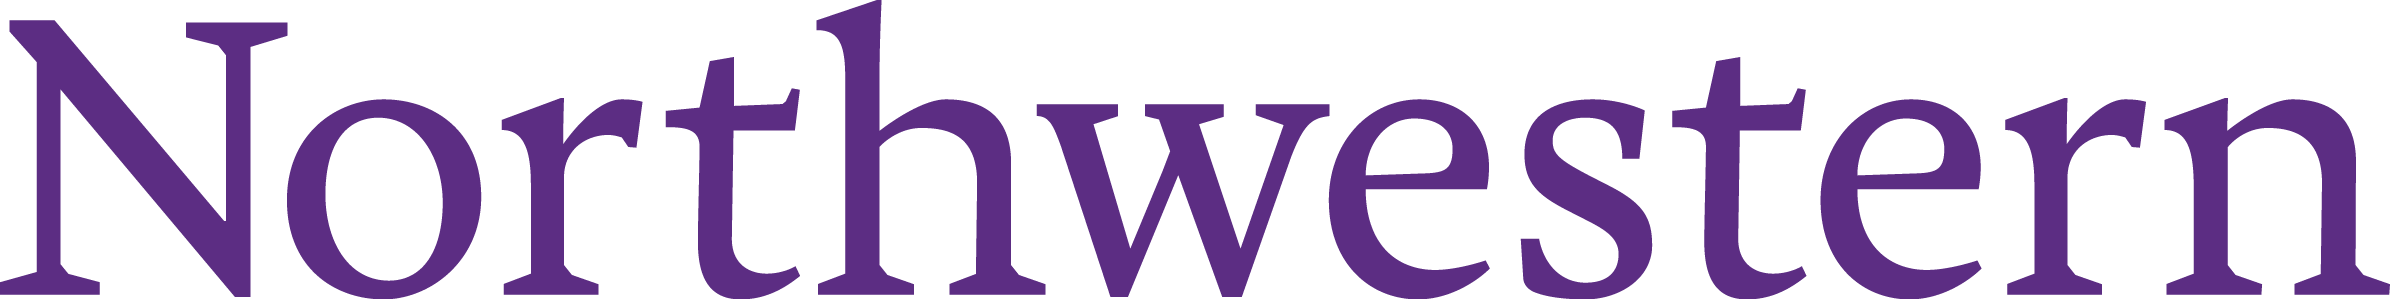 Northwestern University Logo and Seal png